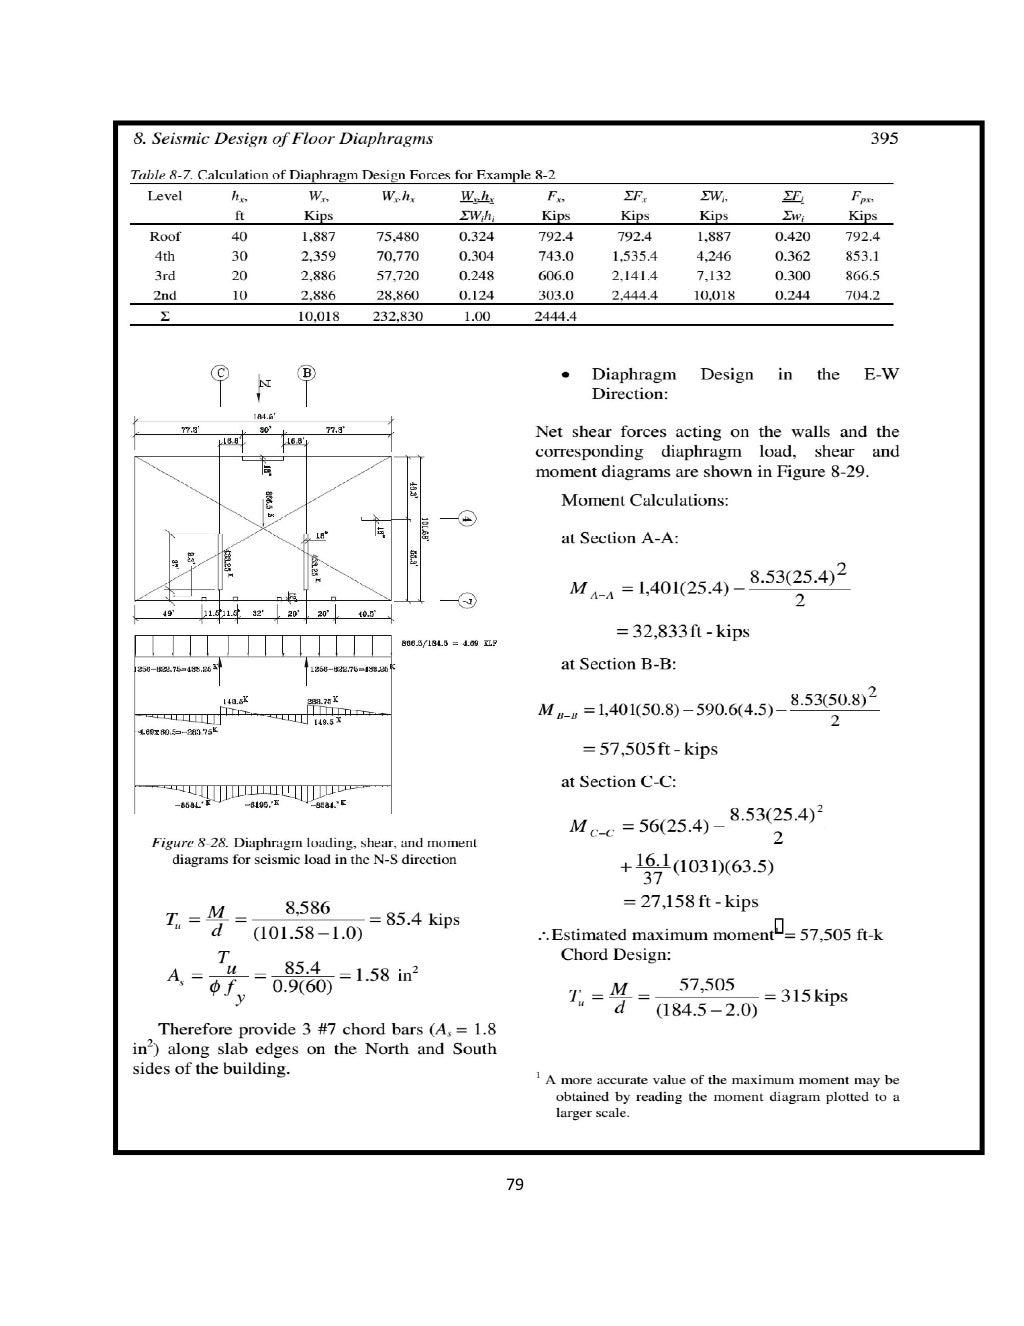 rigid-semi-rigid-flexible-diaphragm-for-seismic-analysis-79-1024.jpg